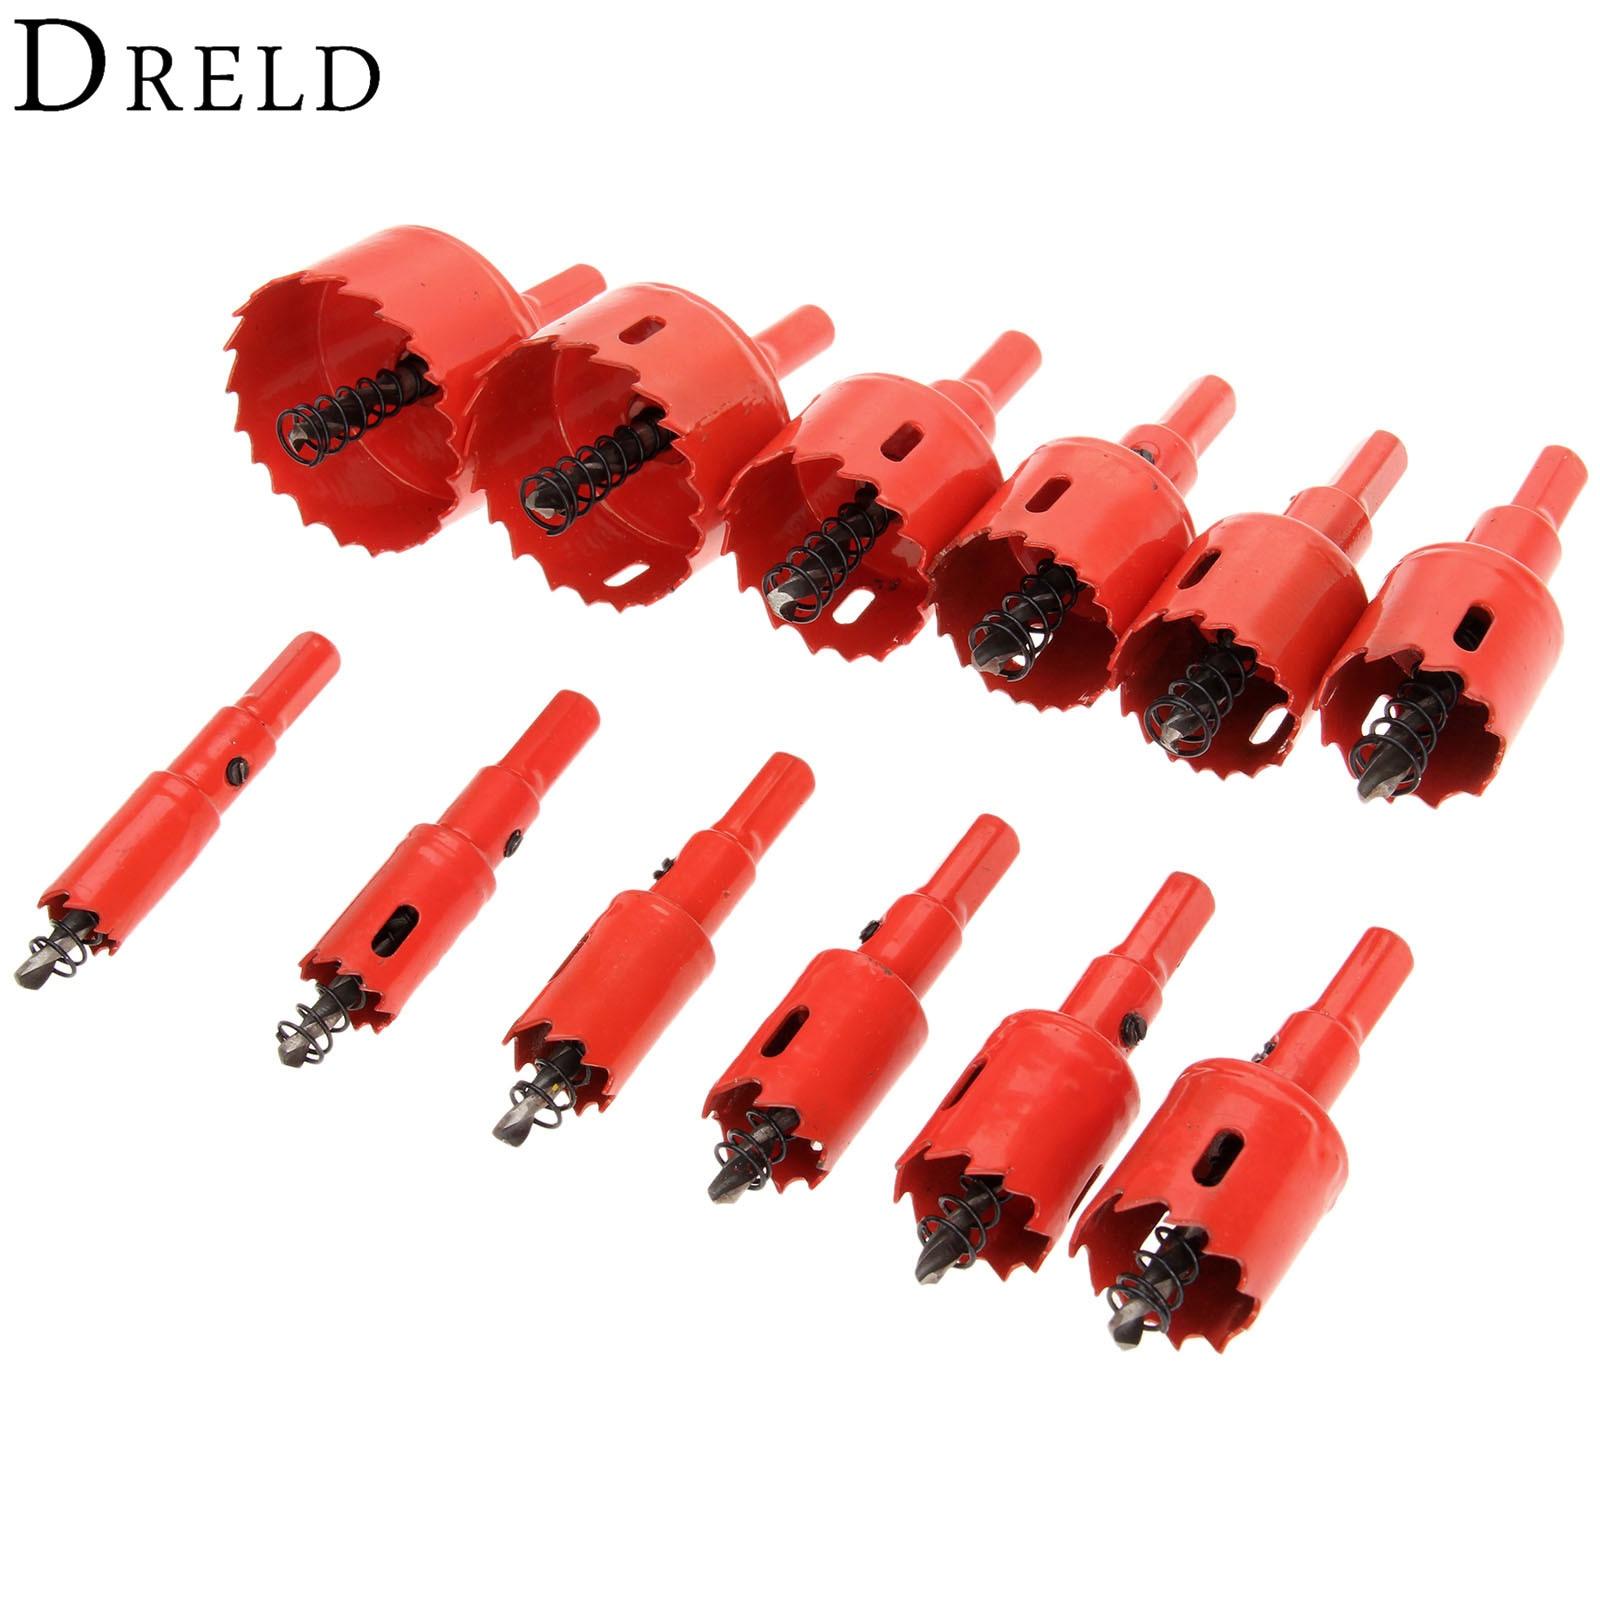 1Pc 16mm-53mm Drill Bit Hole Saw Twist Drill Bits Cutter Power Tool Metal Holes Drilling Kit Carpentry Tools For Wood Steel Iron